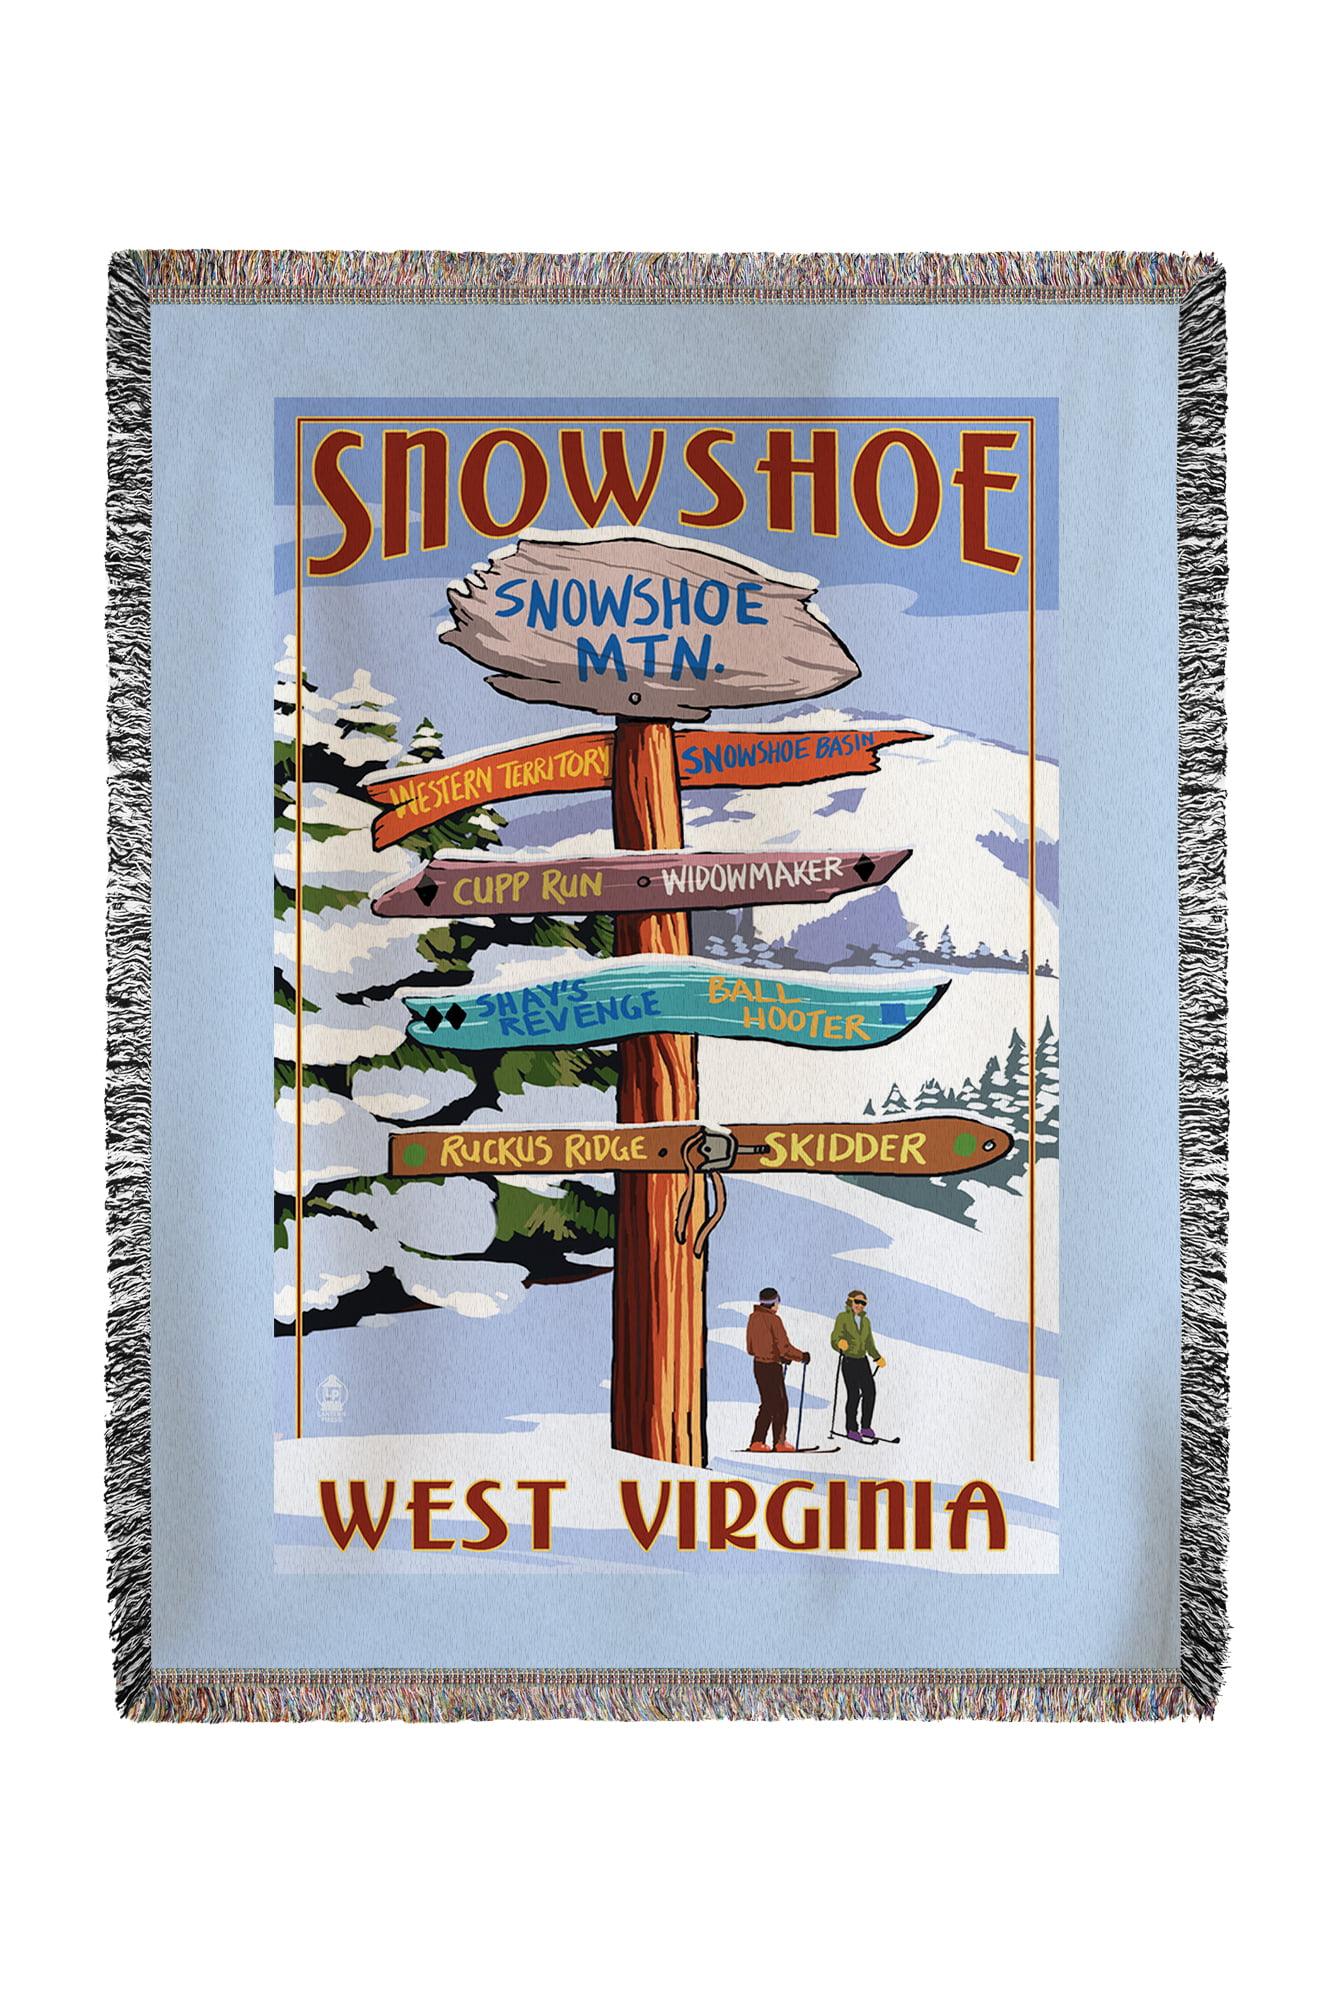 Snowshoe, West Virginia Destinations Sign Lantern Press Artwork (60x80 Woven Chenille Yarn Blanket) by Lantern Press